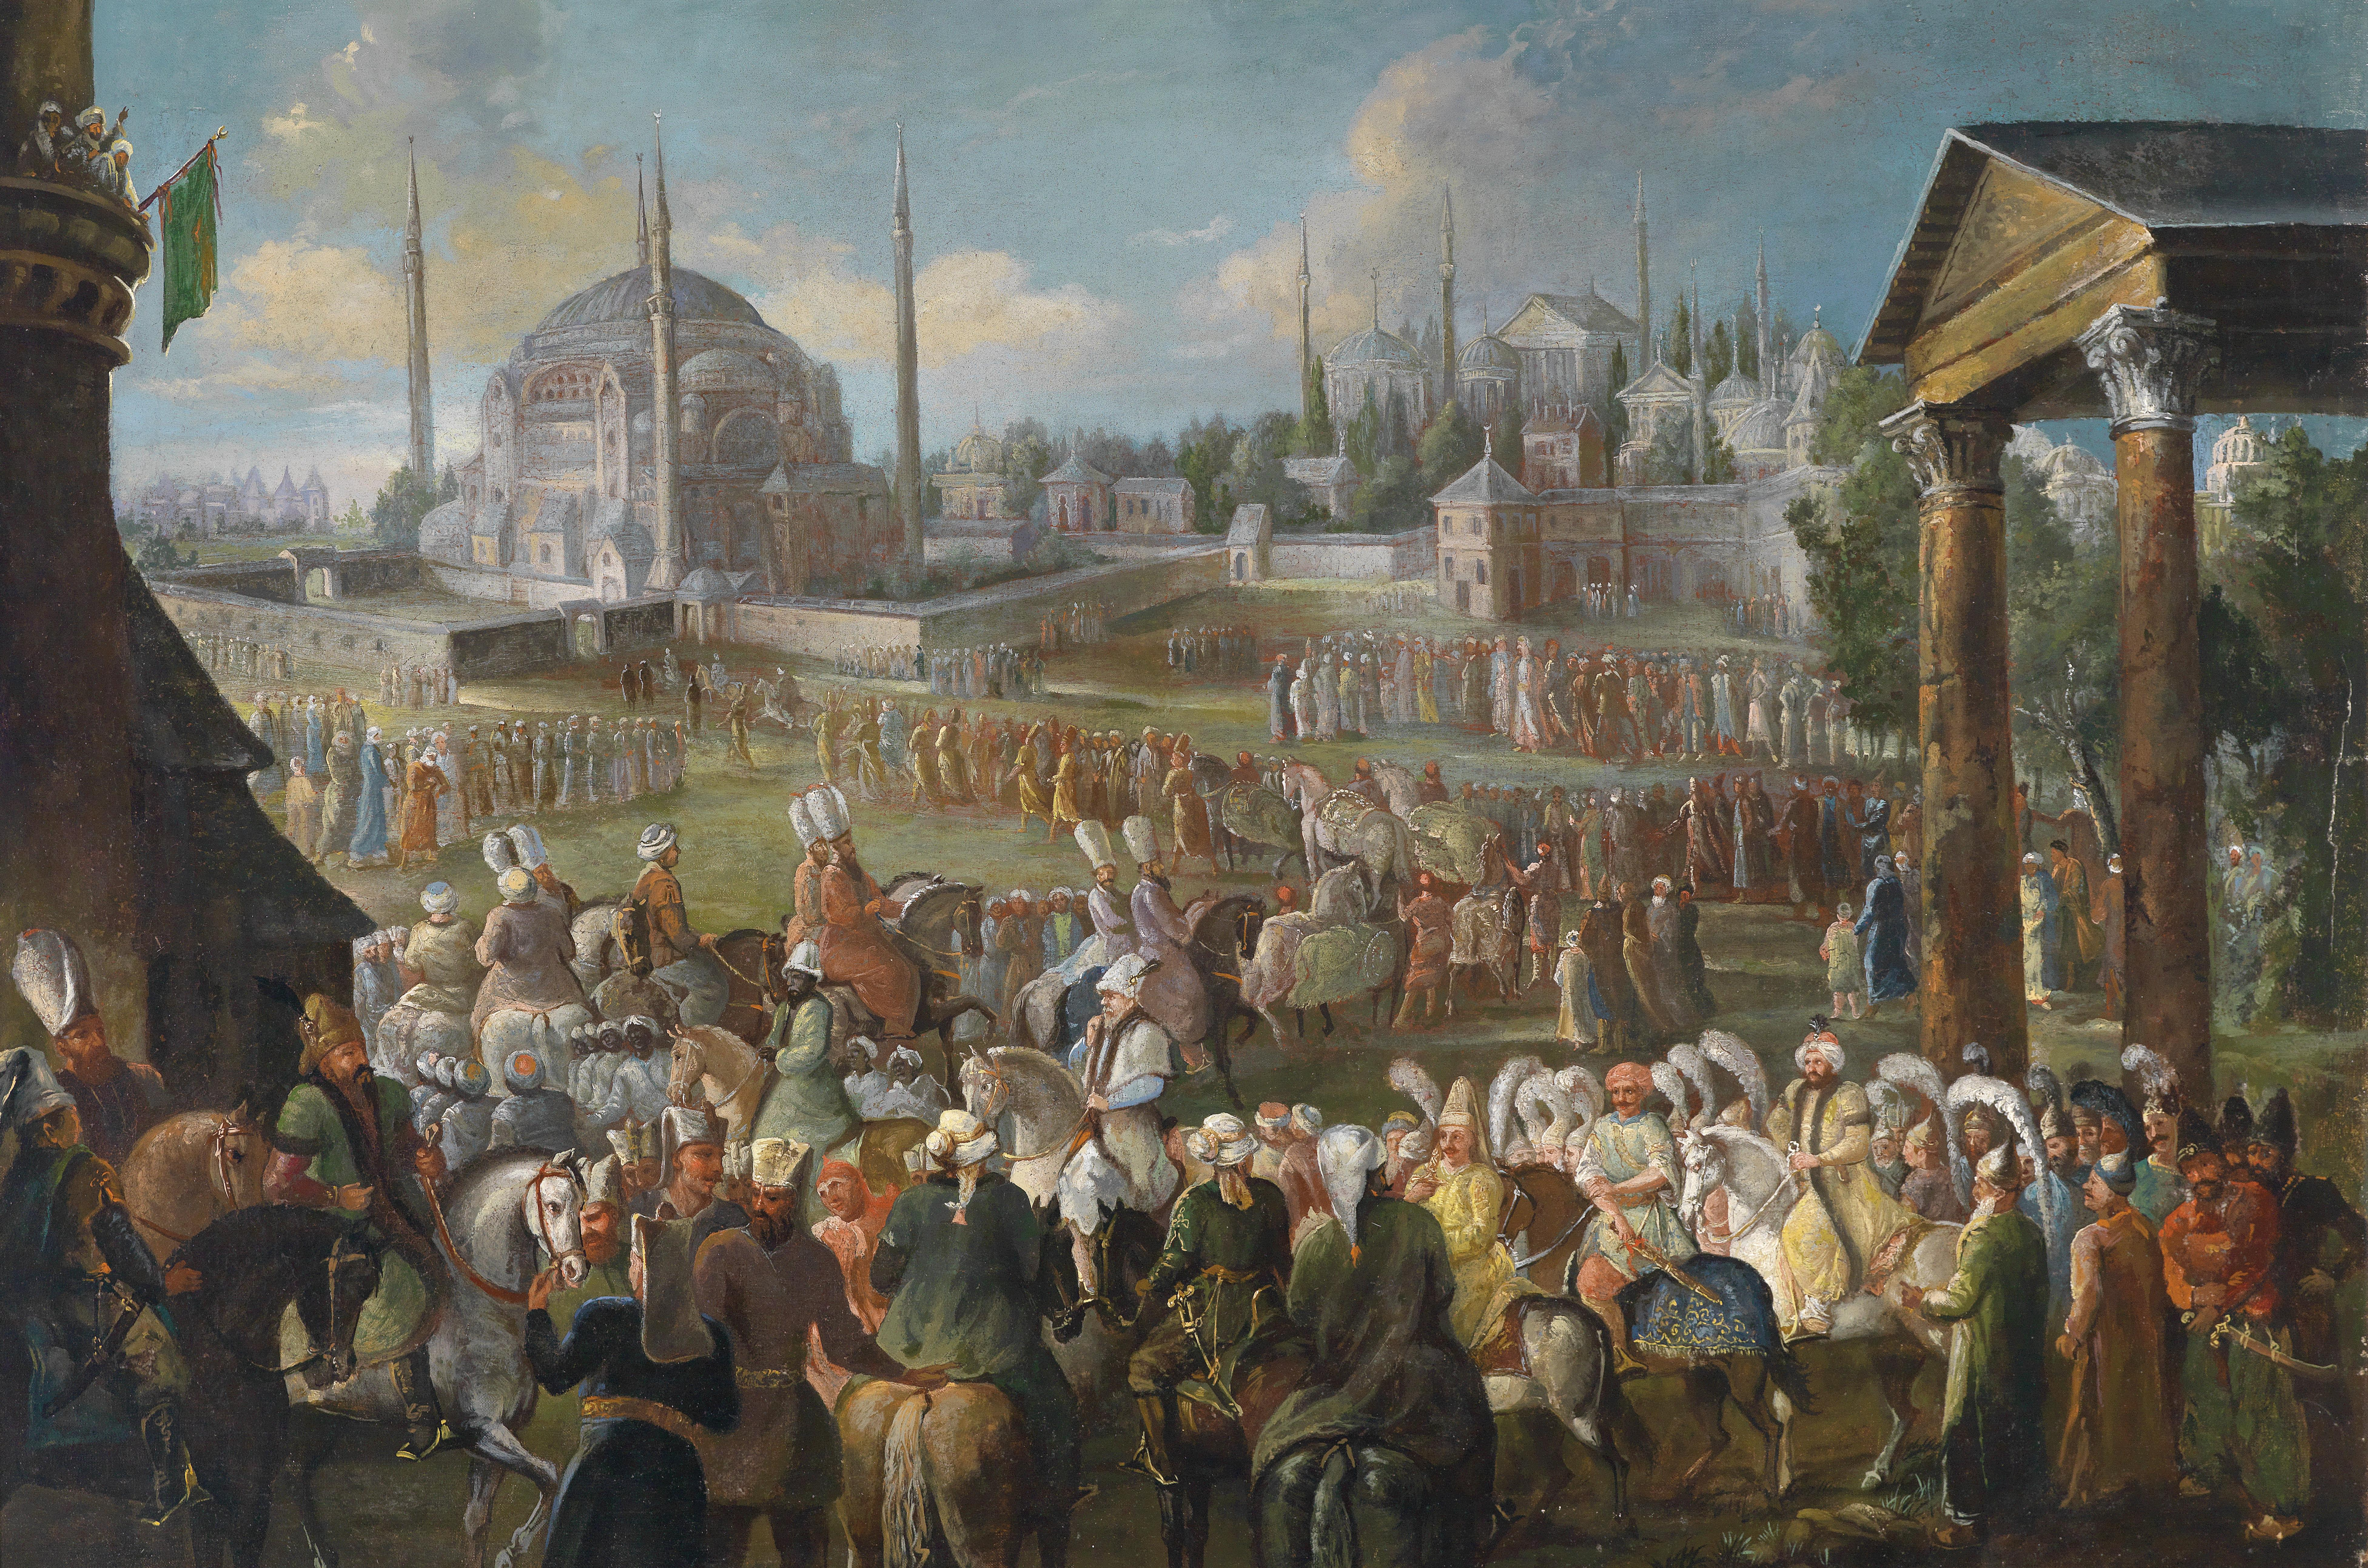 Procession of the Sultan in Istanbul, Jean Baptiste van Moor.